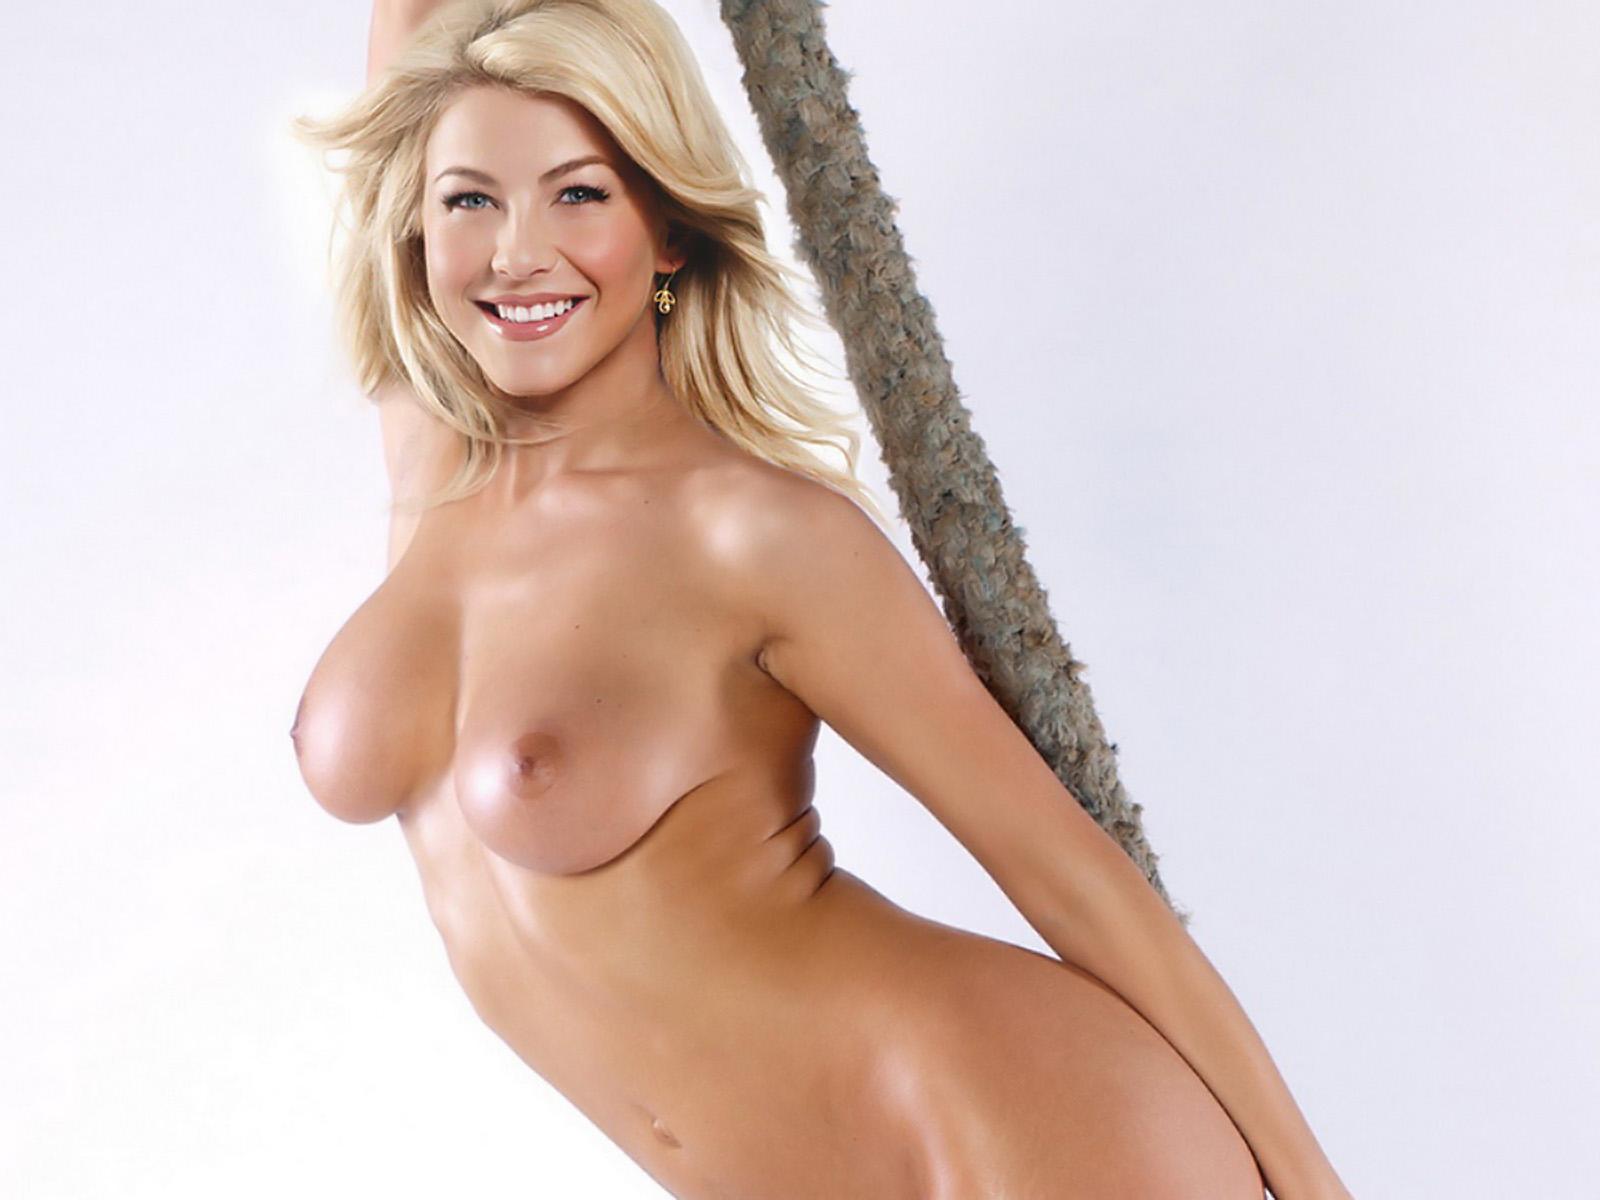 Topless Julianne Hough naked (48 photos), Ass, Leaked, Instagram, lingerie 2020